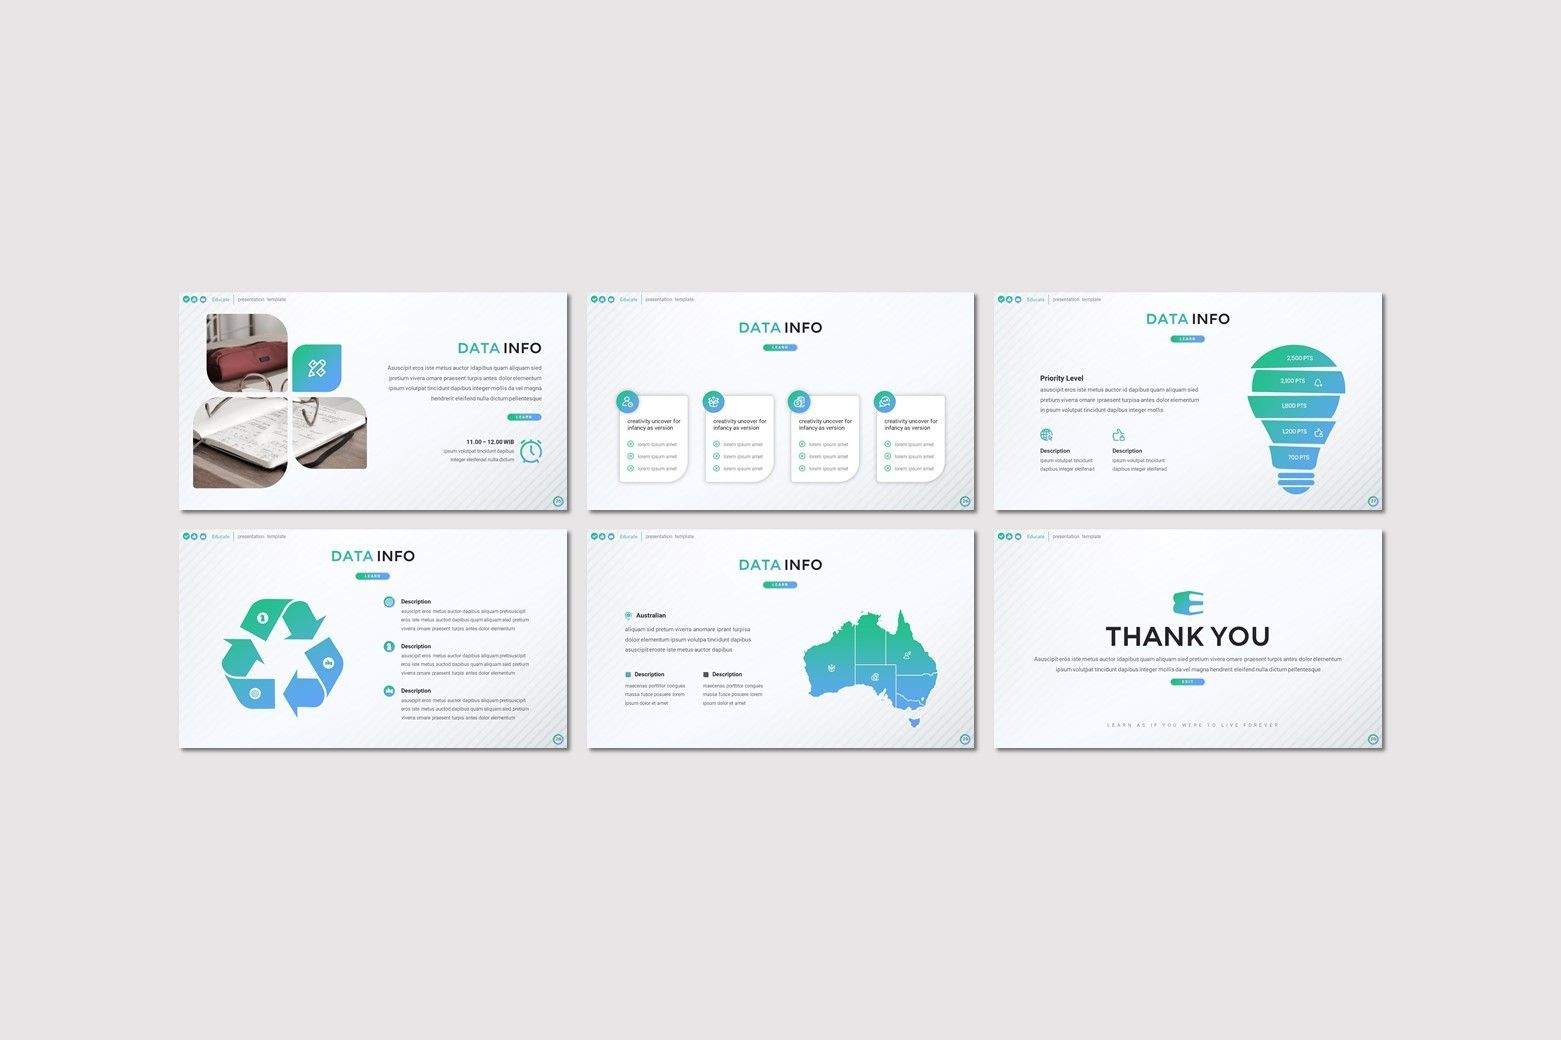 Educate - Google Slides Template, Slide 4, 08052, Presentation Templates — PoweredTemplate.com